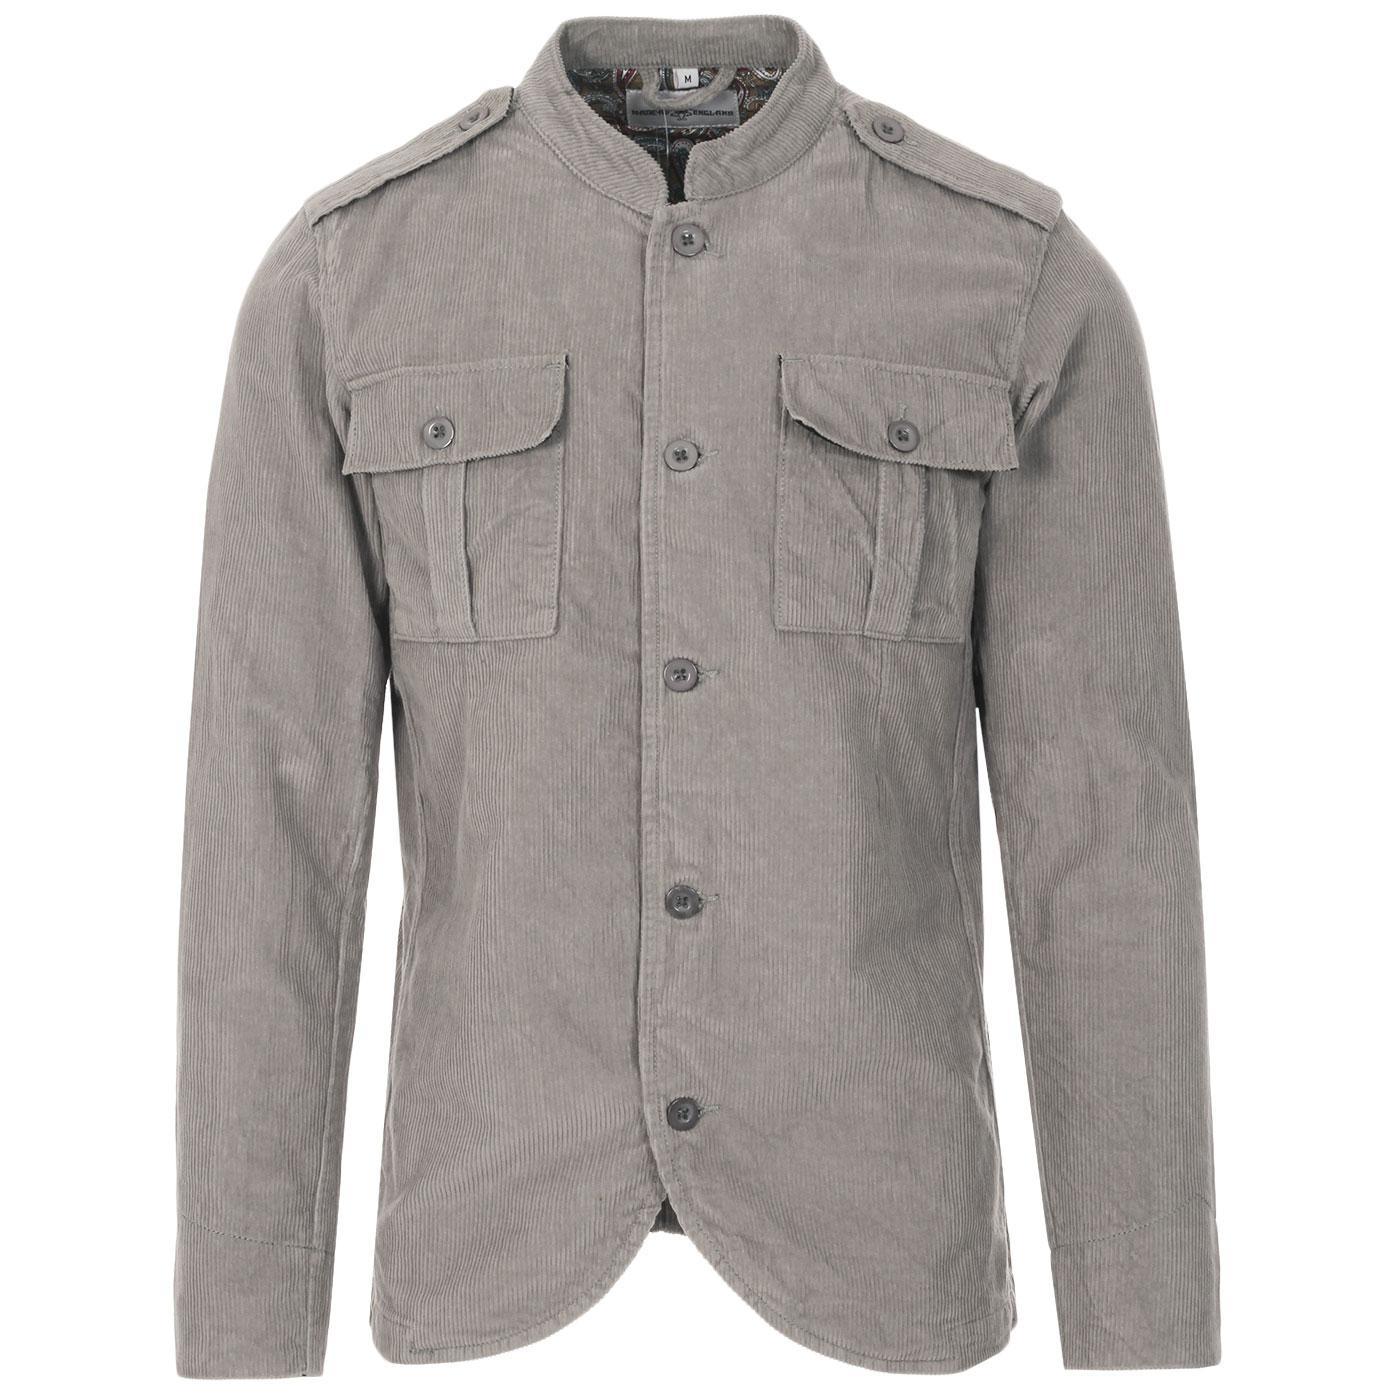 Pepper MADCAP ENGLAND Mod Cord Tunic Jacket (DG)